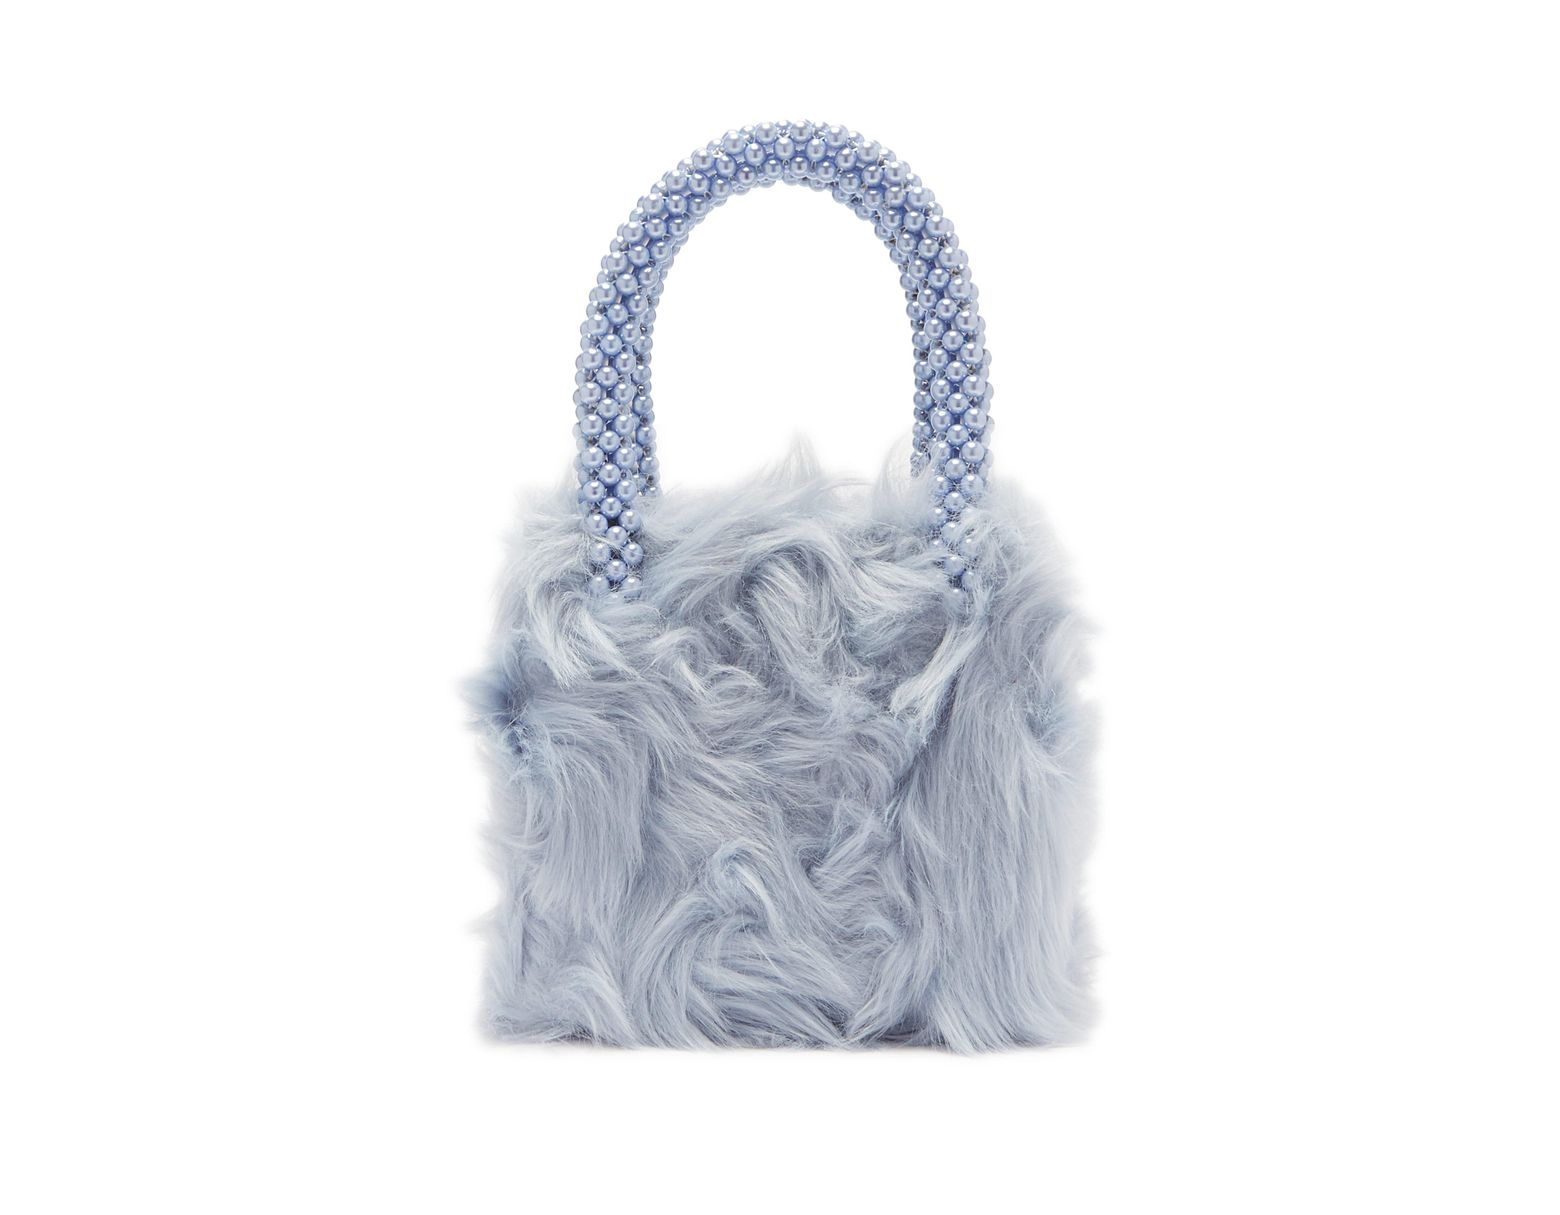 Halley Femme Coloris Fourrure Imitation En De Sac Bleu oeBWrdxC